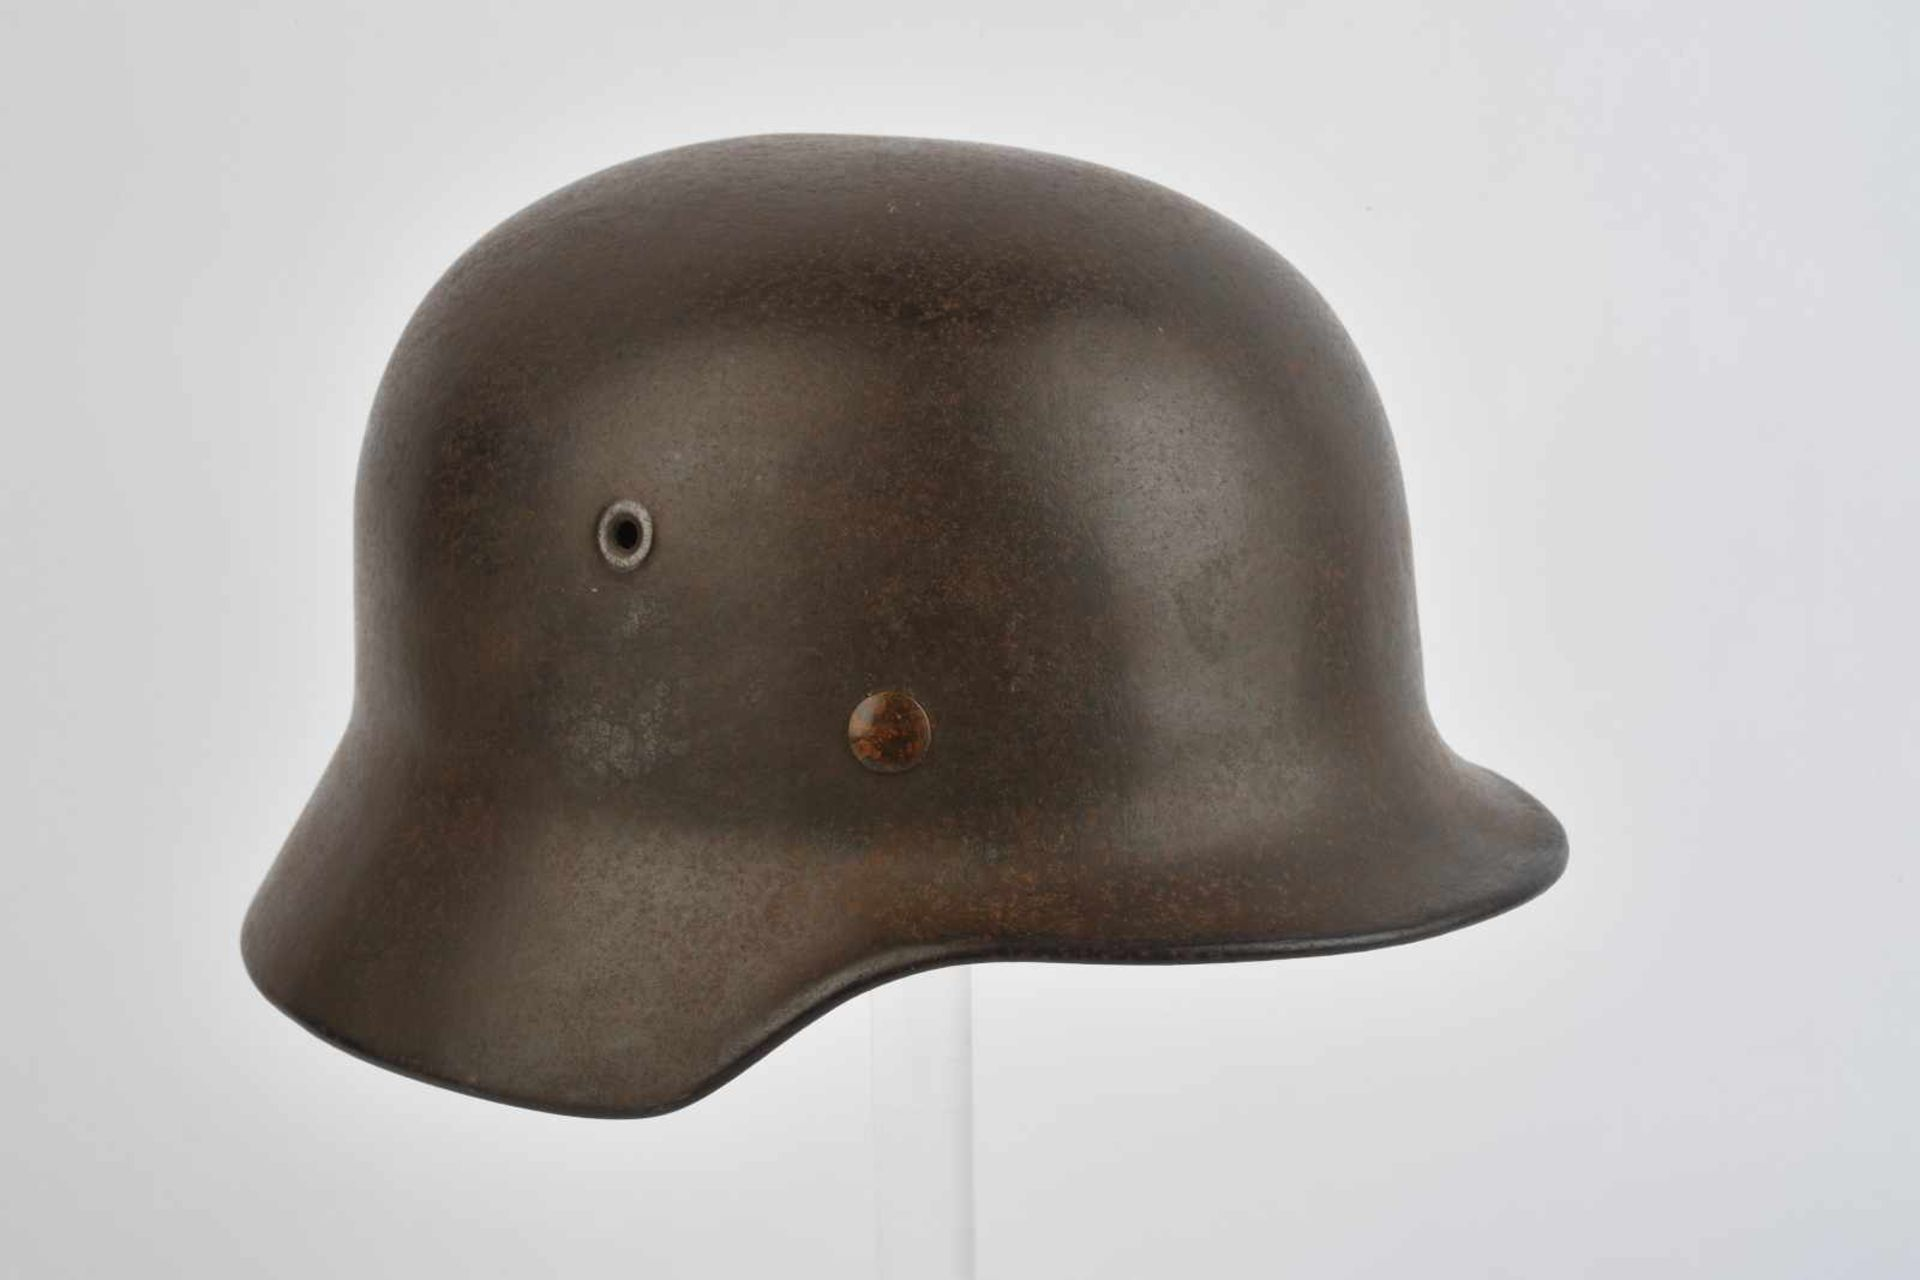 Casque de la Heer. Coque de casque modèle 40 de fabrication EF. Peinture feldgrau à 70%,